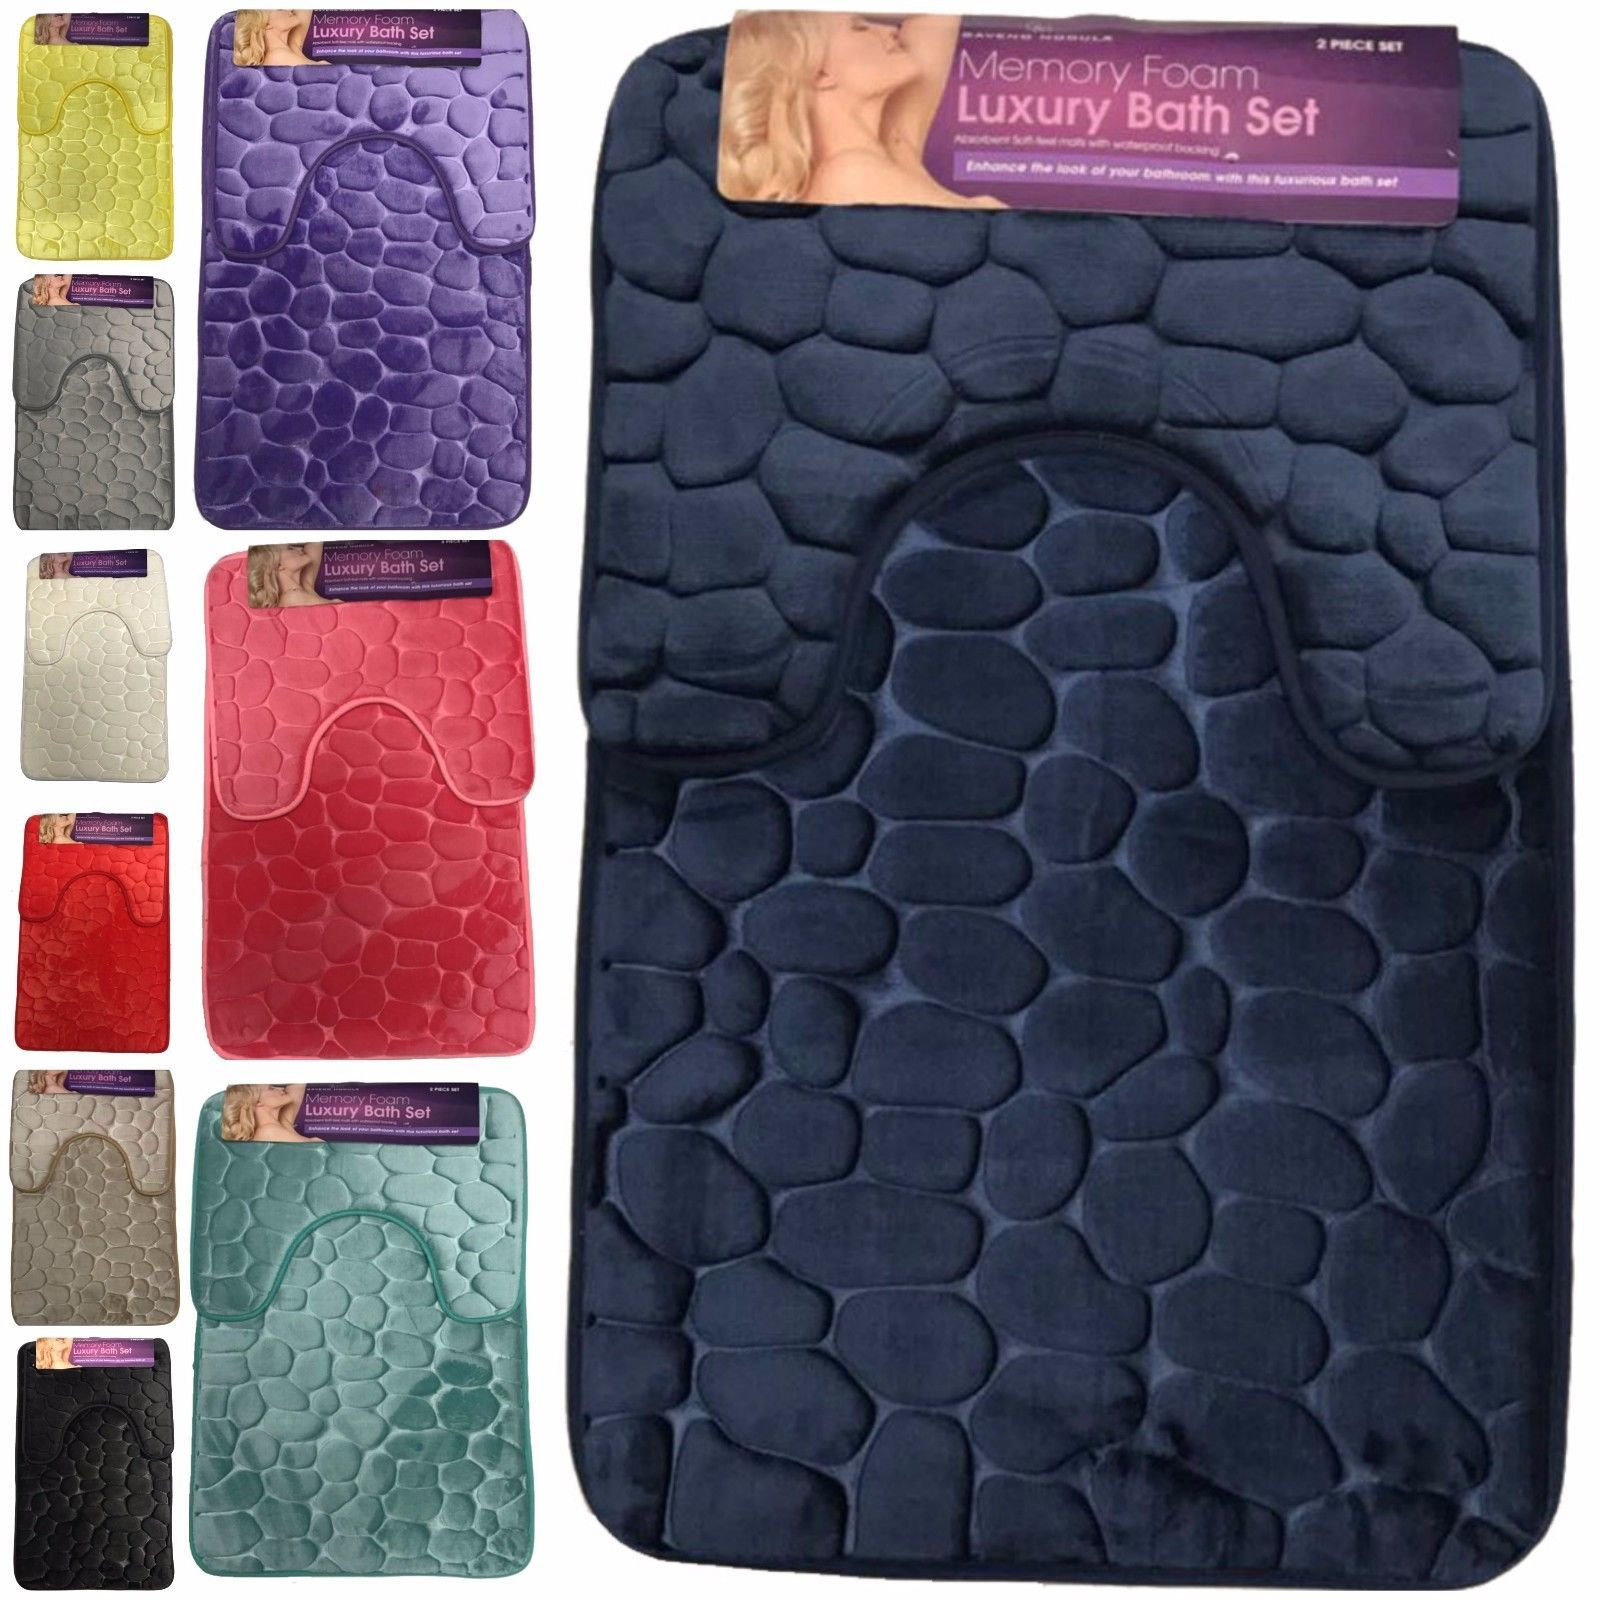 Bath mat set 2 piece non slip pedestal mat pebbles design